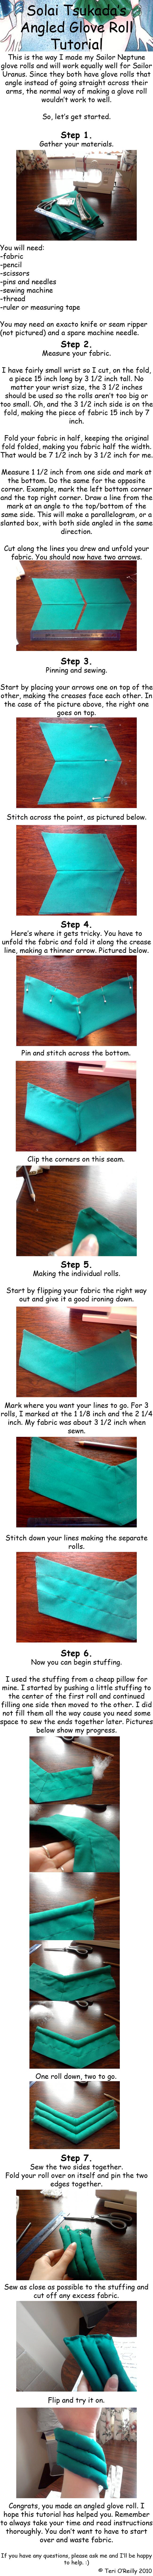 Angled Glove Roll Tutorial by Solai-Tsukada